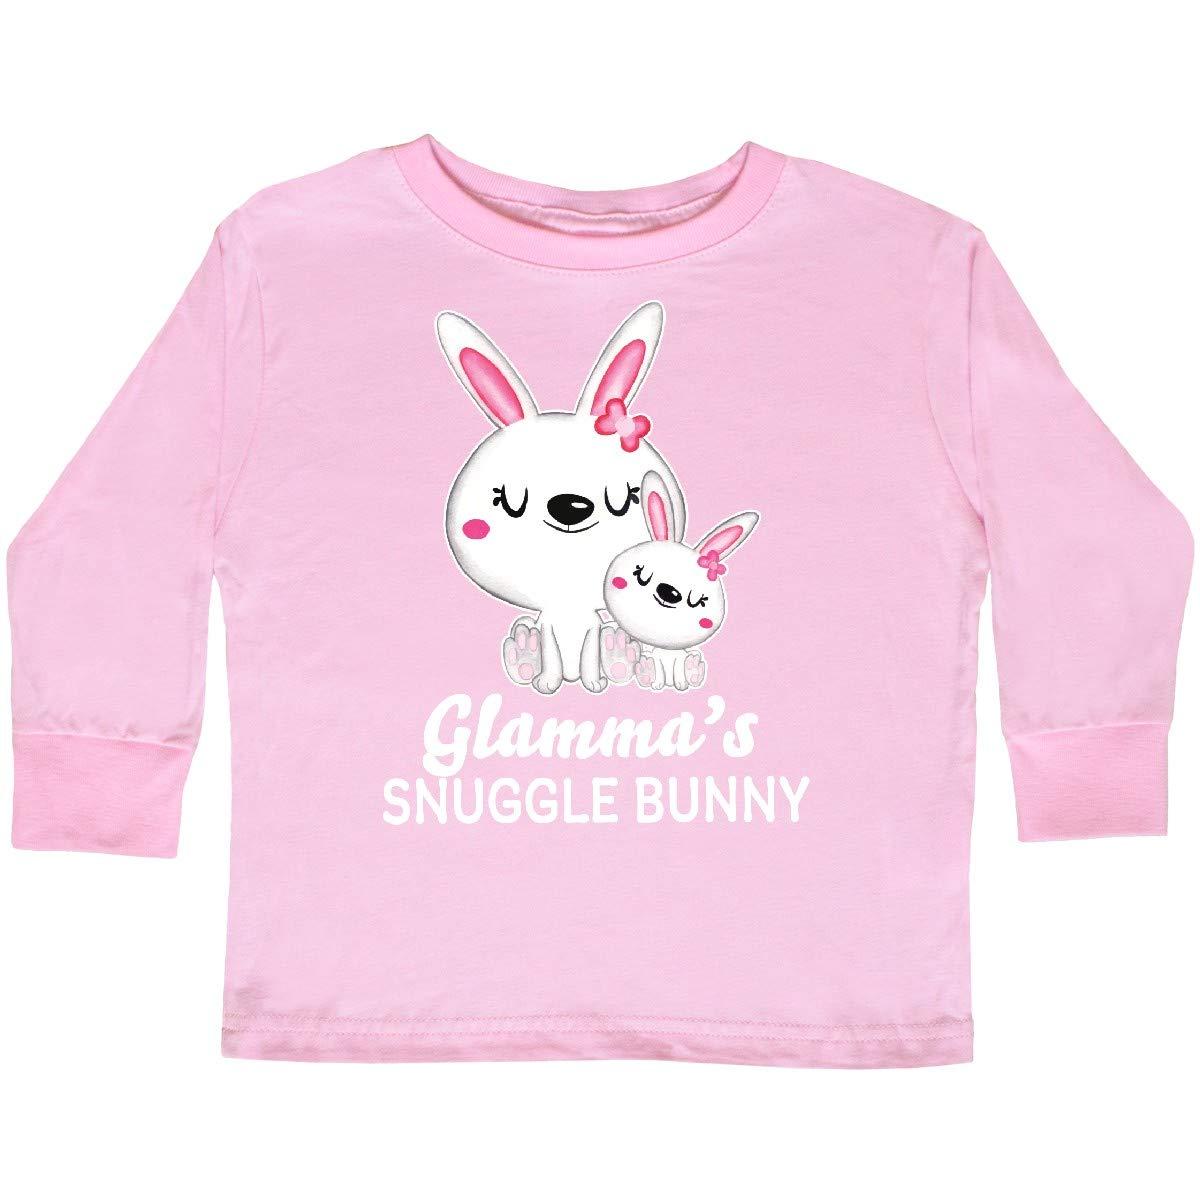 inktastic Glammas Snuggle Bunny Easter Toddler Long Sleeve T-Shirt